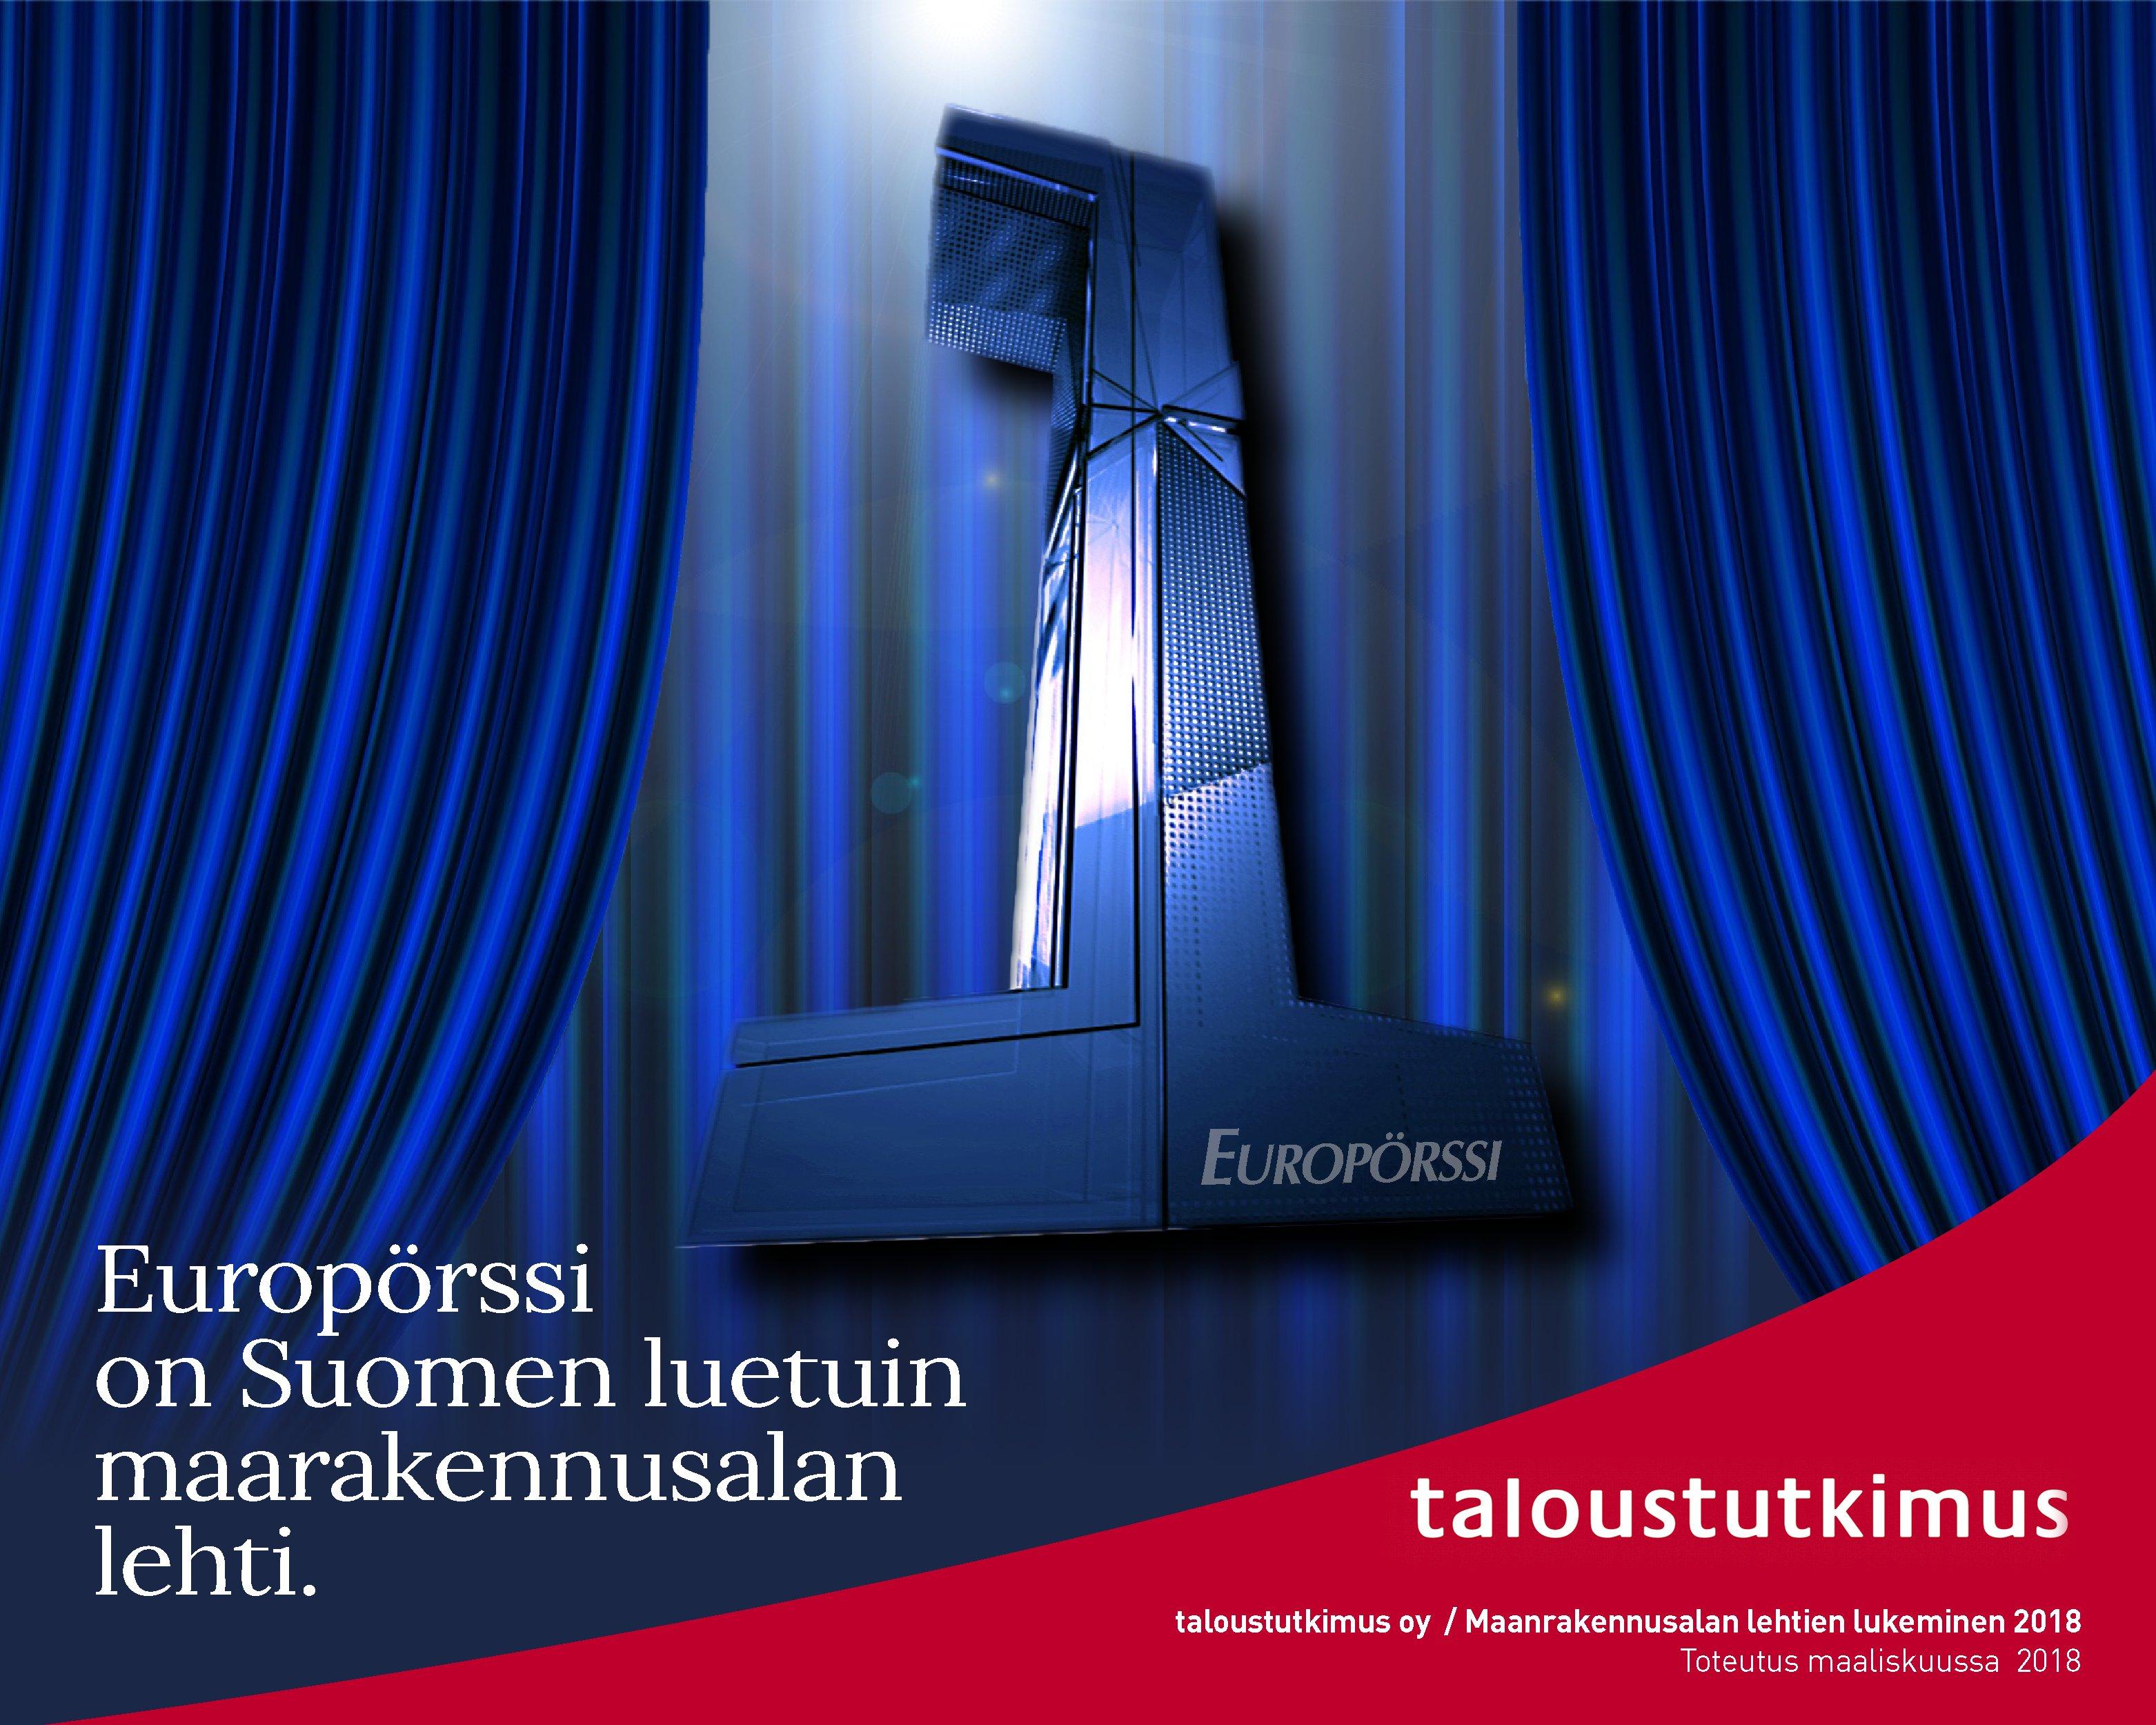 EP_Taloustutkimus_750x600